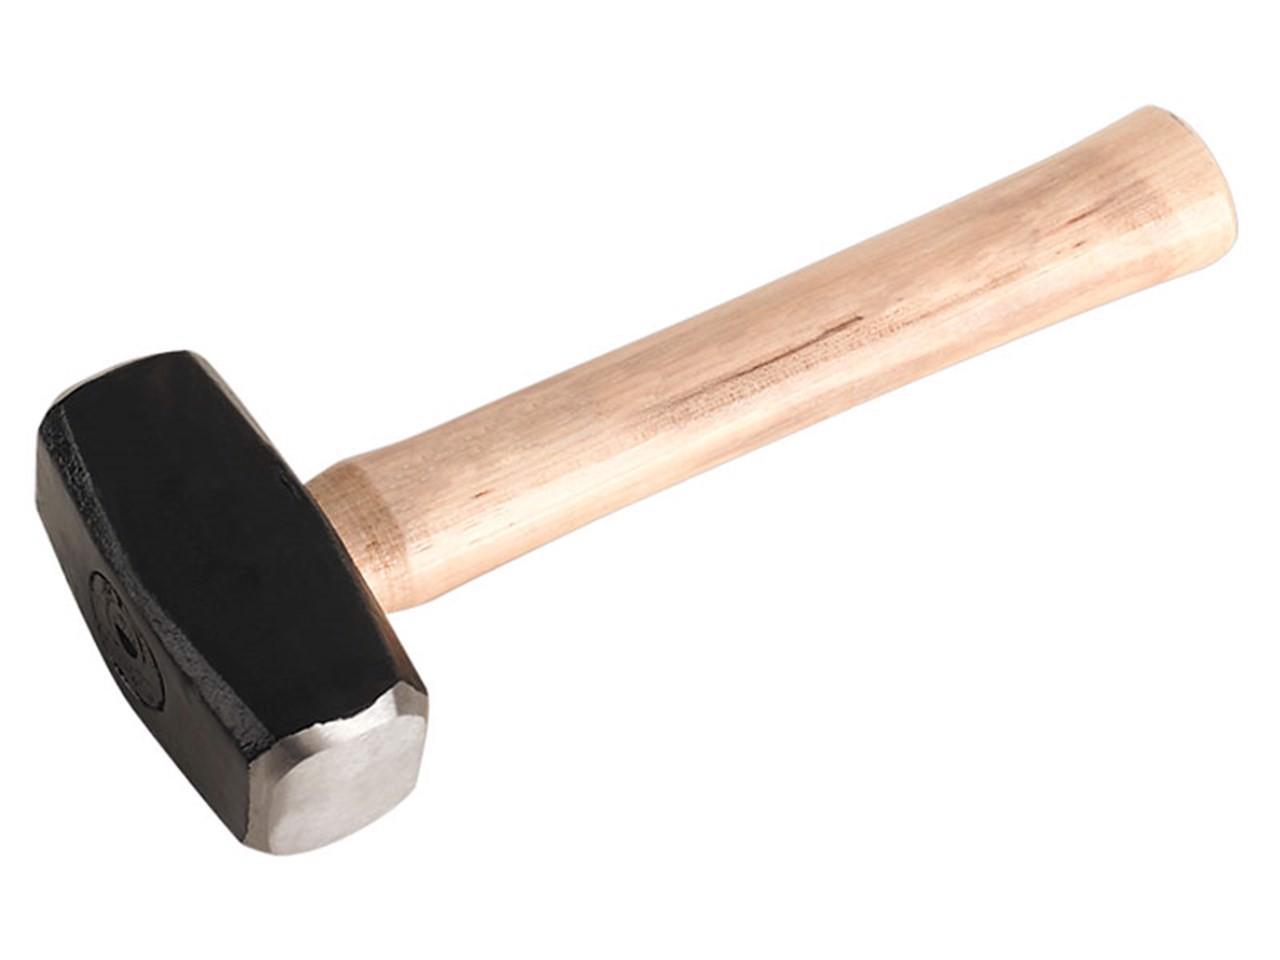 Búa sắt cầm tay 0.3kg